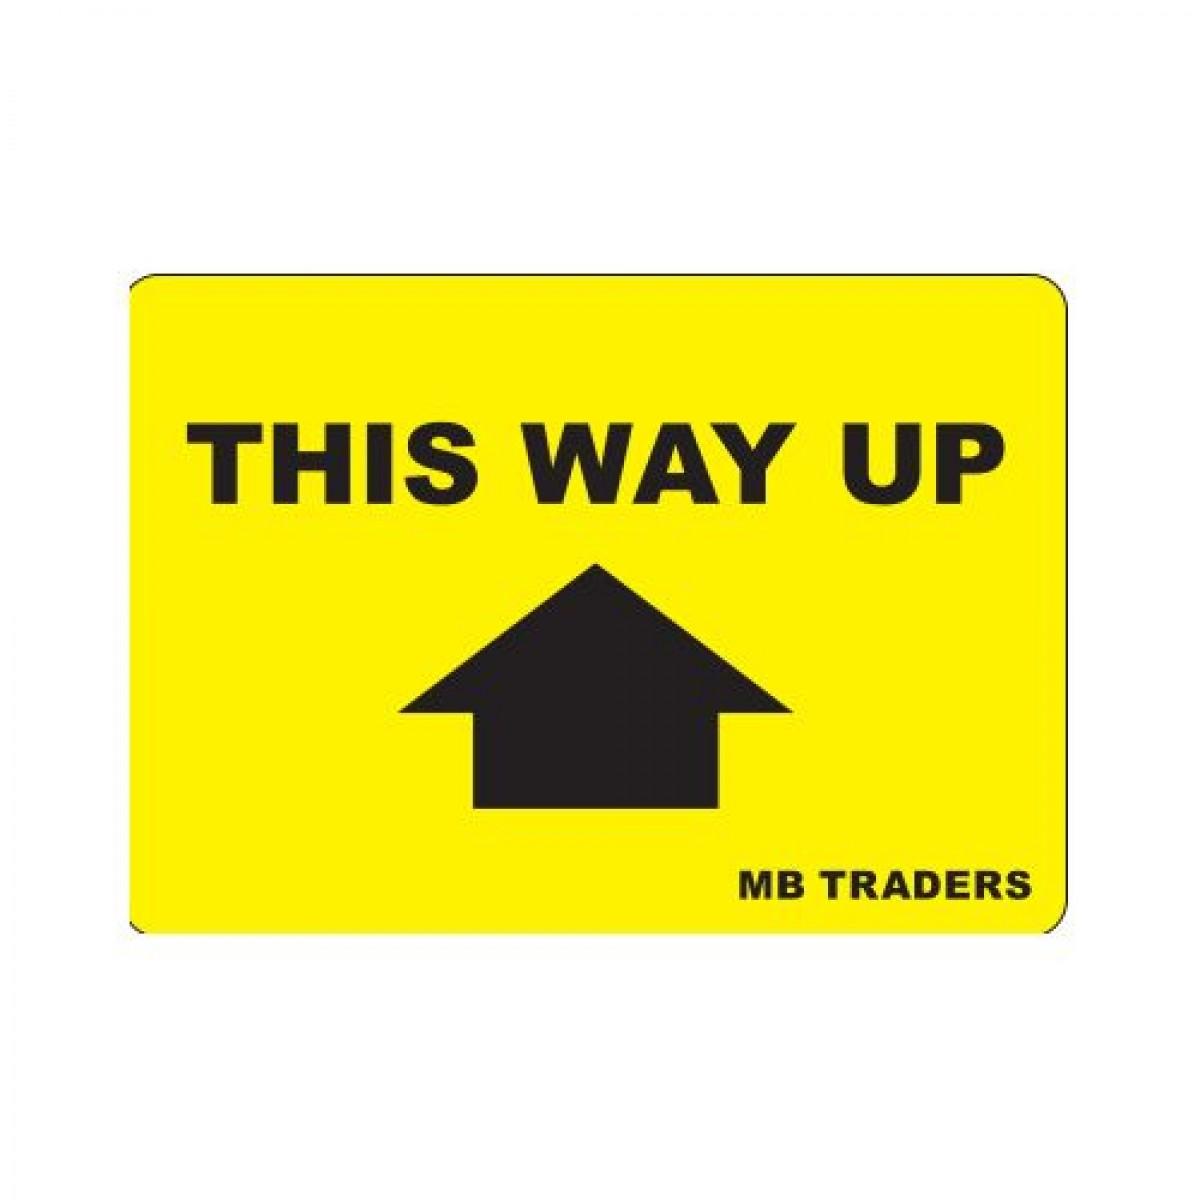 Moving Labels - 4 This Way Up Labels - Mbboxoutlet.com.au  Moving Labels -...